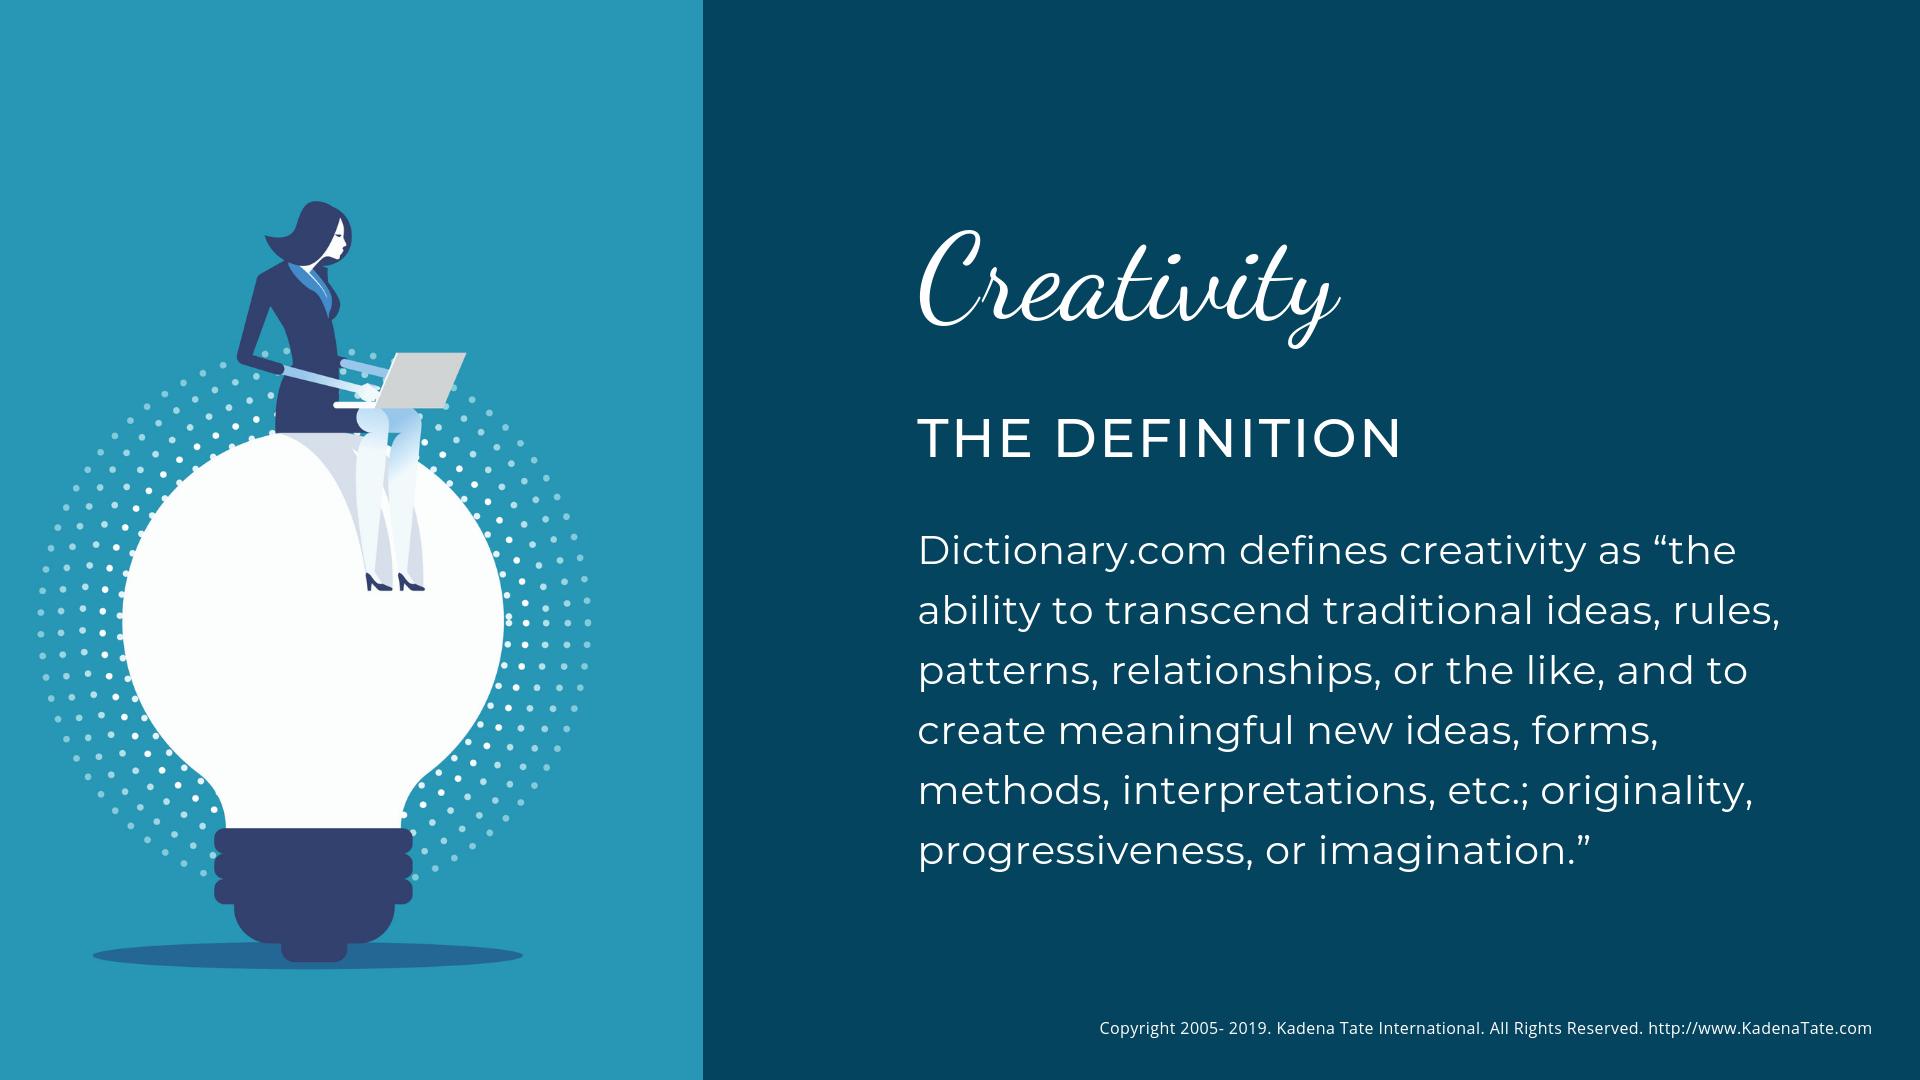 11DefineCreativity.png